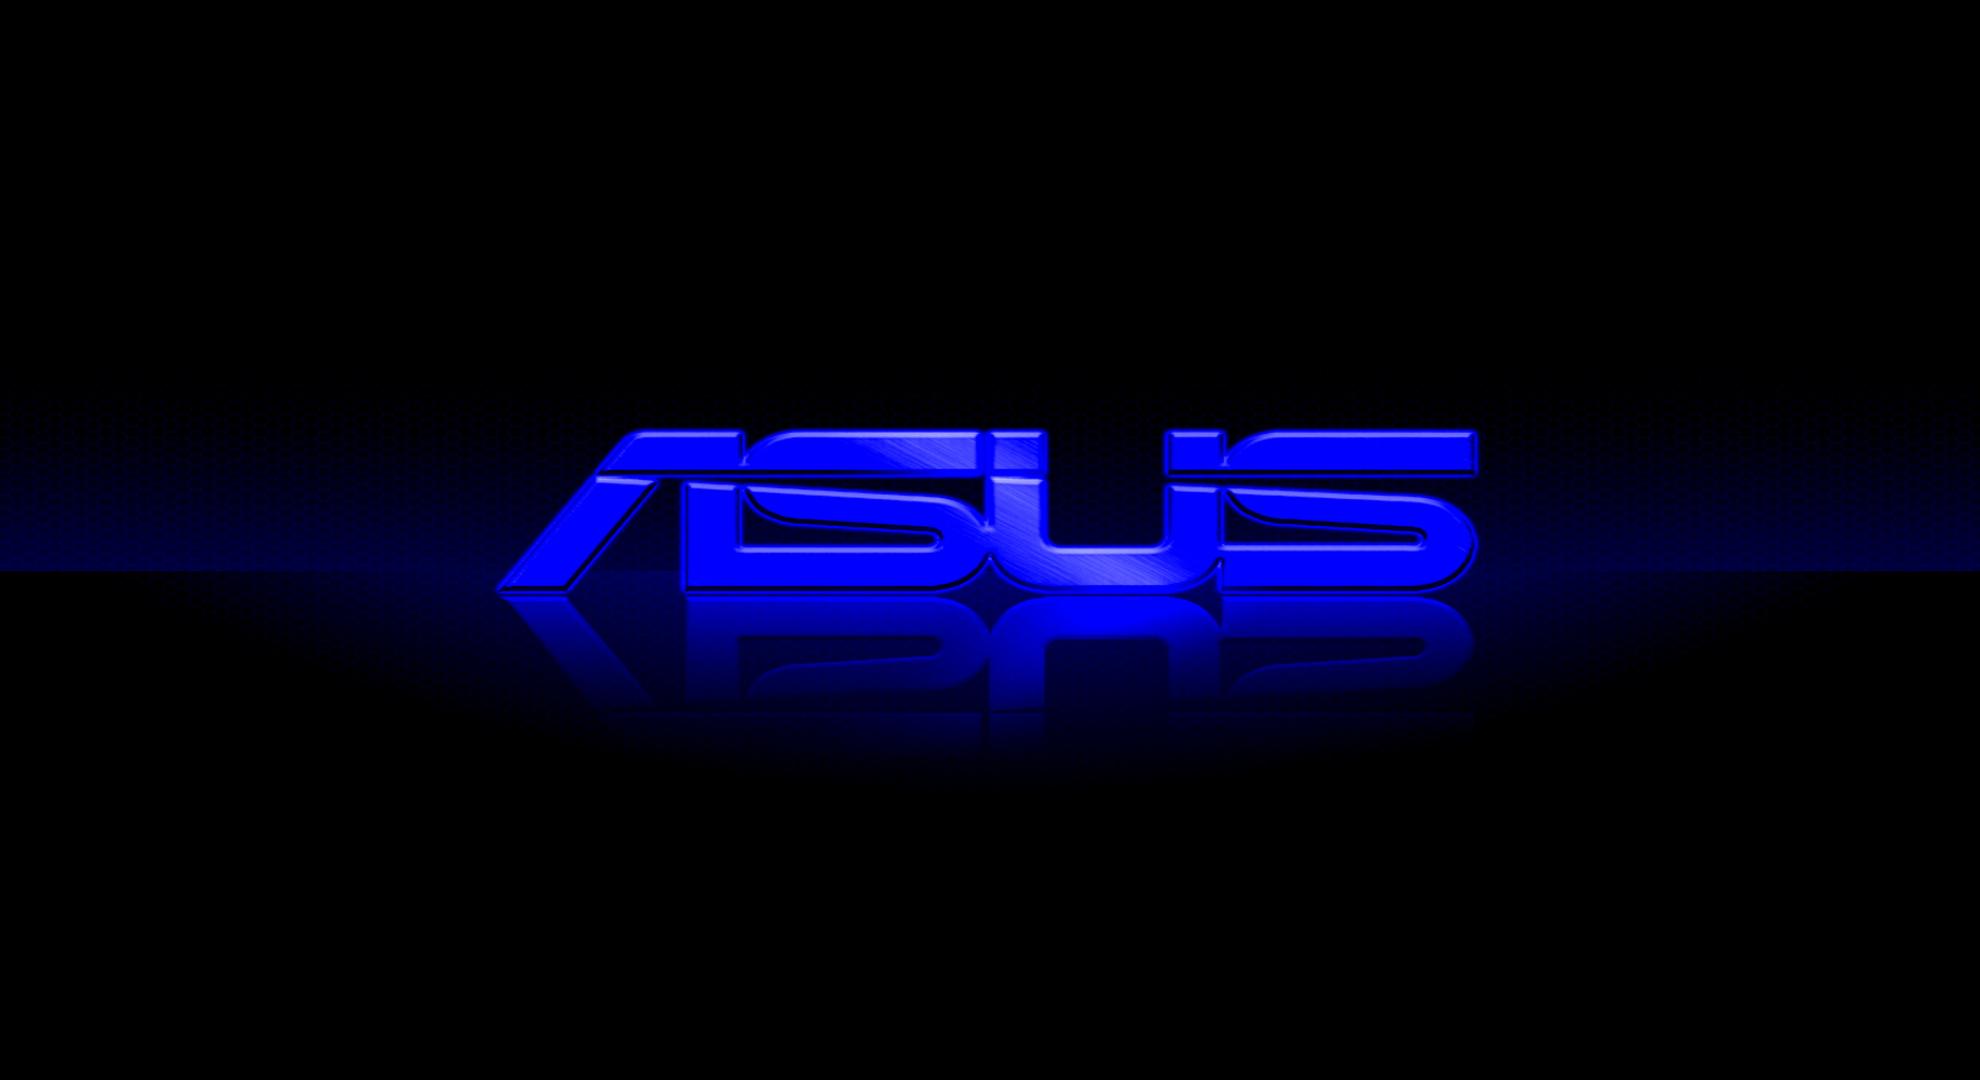 Asus Logo Computer Wallpapers Desktop Backgrounds 1980x1080 ID 1980x1080